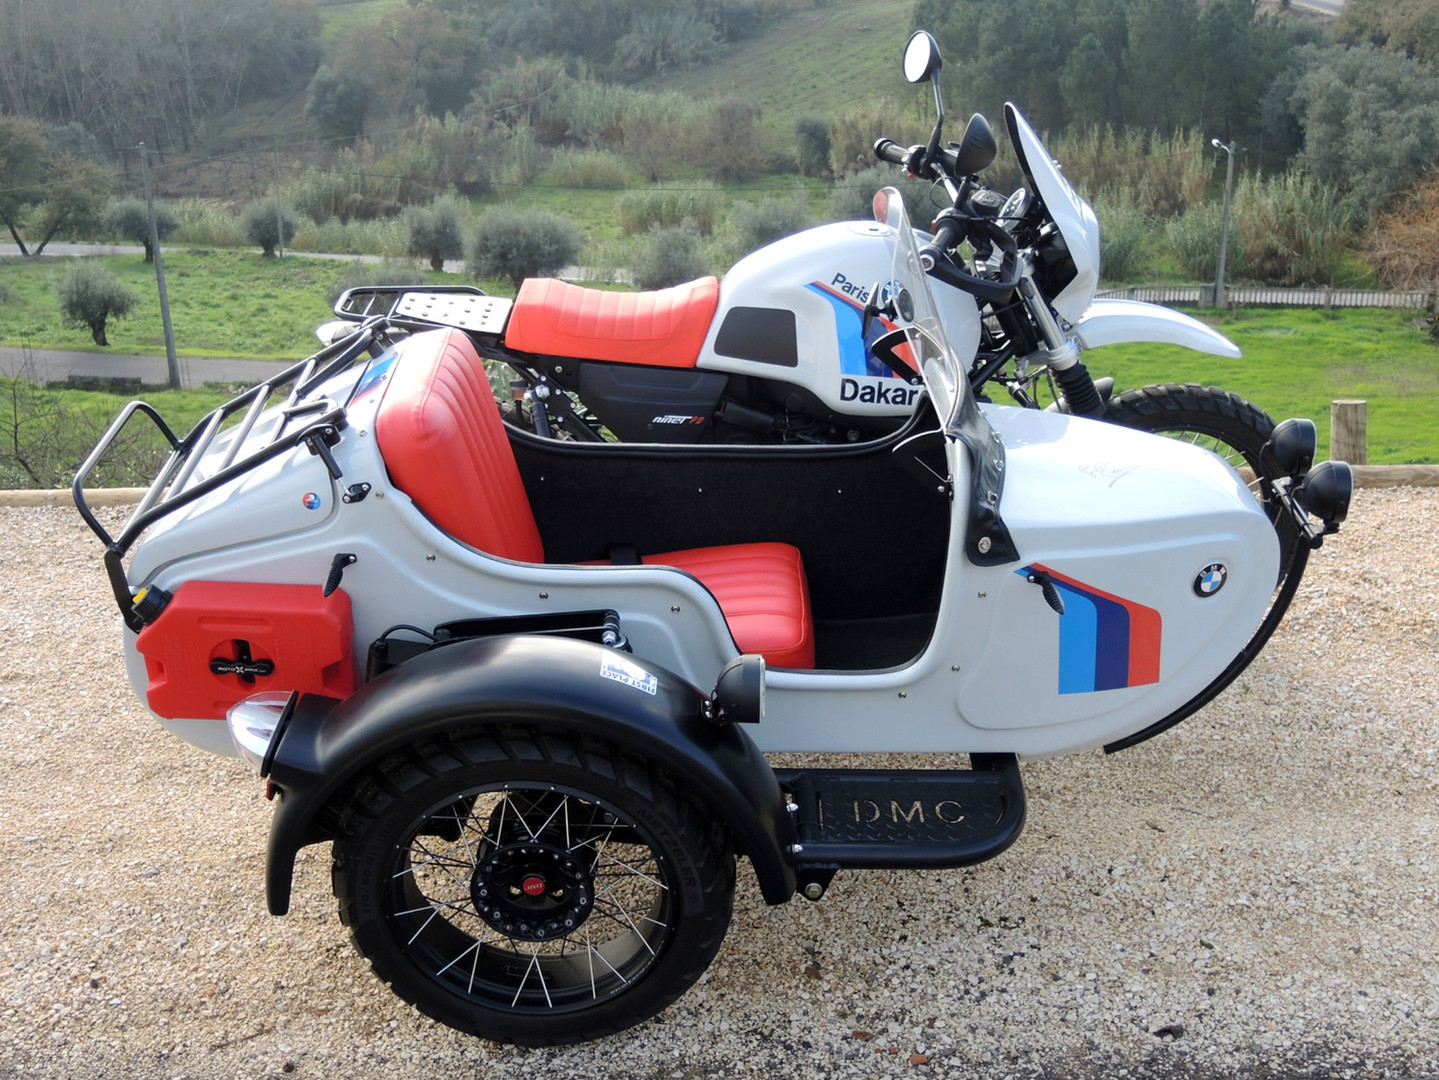 Gusto Motorbikes_BMW RnineT Paris Dakar Adventure Sidecar Combination